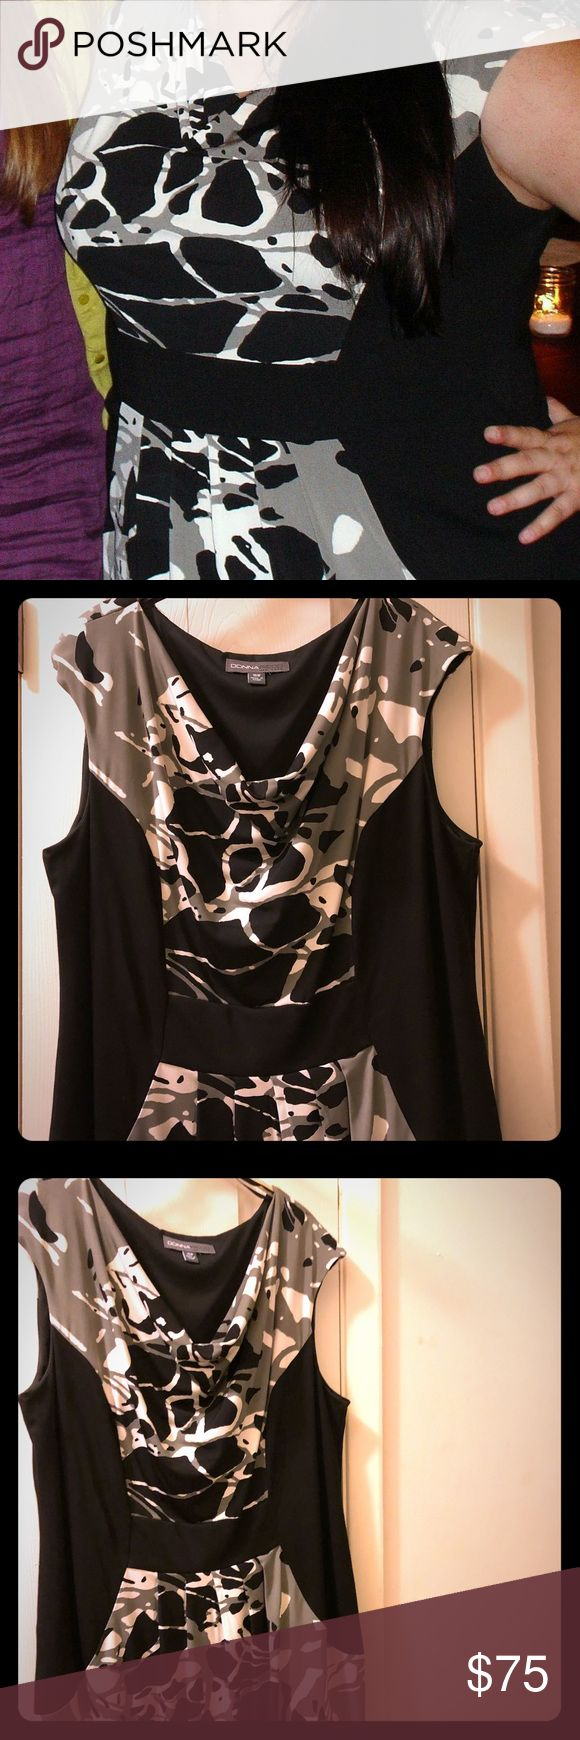 Like new Donna Ricco plus size dress- sheath 16W Donna Rocco New York like new (worn once) dress. Size 16W, plus. Gray, black, white print. Black color blocking. Pullover sheath. Donna Ricco Dresses